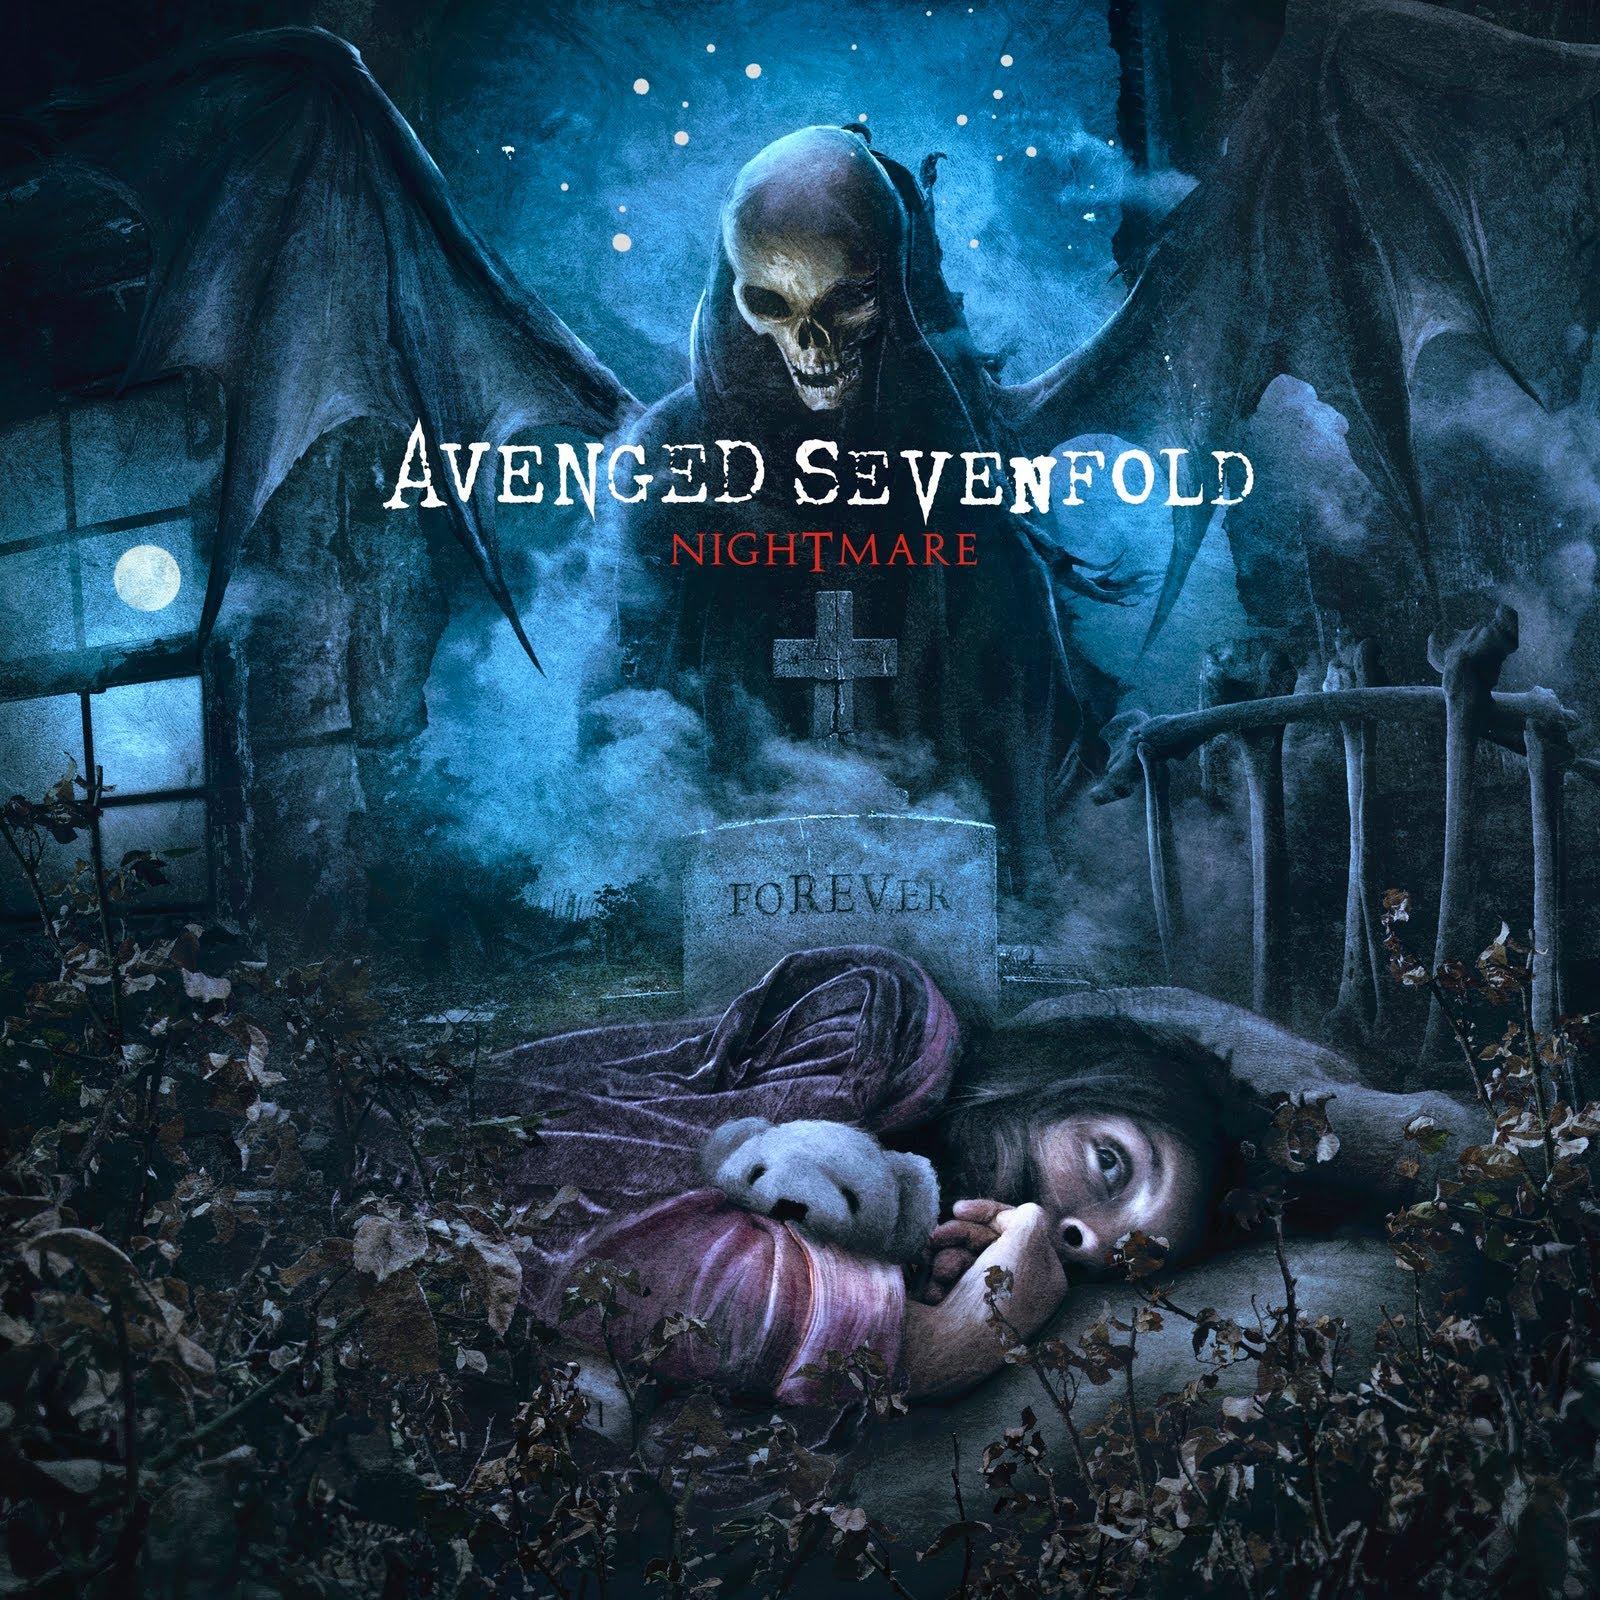 AVENGED SEVENFOLD - Nightmare cover